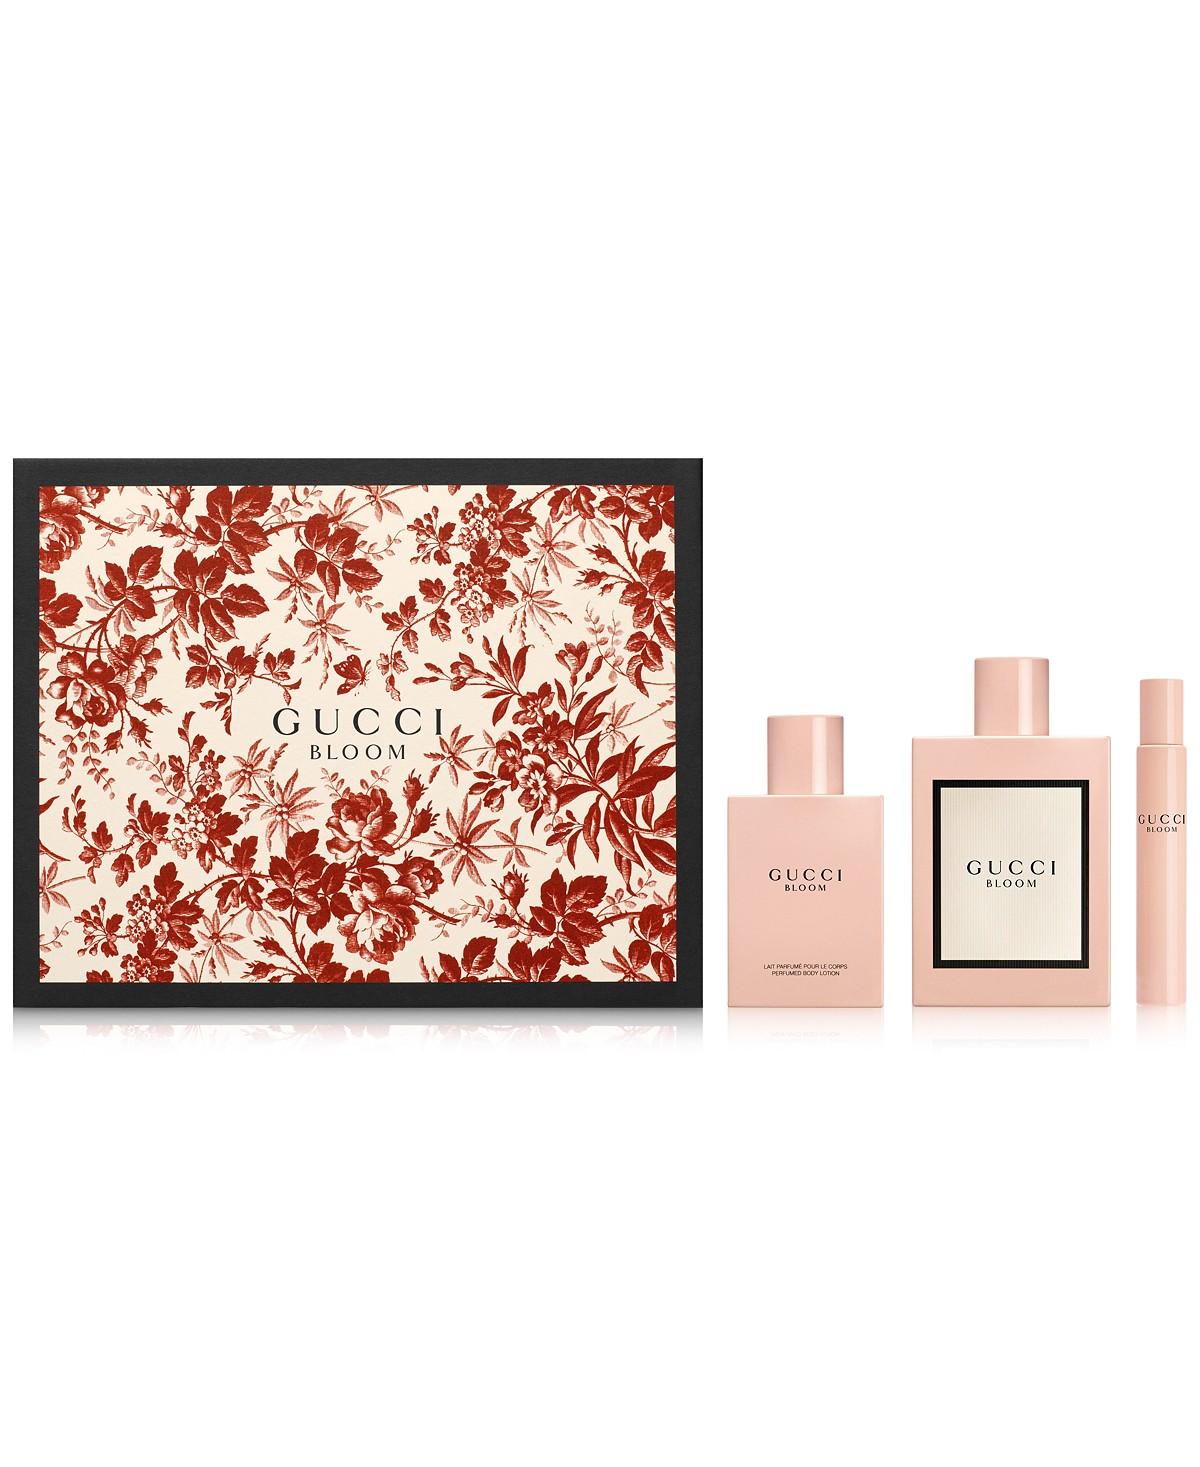 Gucci 3-Pc. Bloom Gift Set | Hermosaz